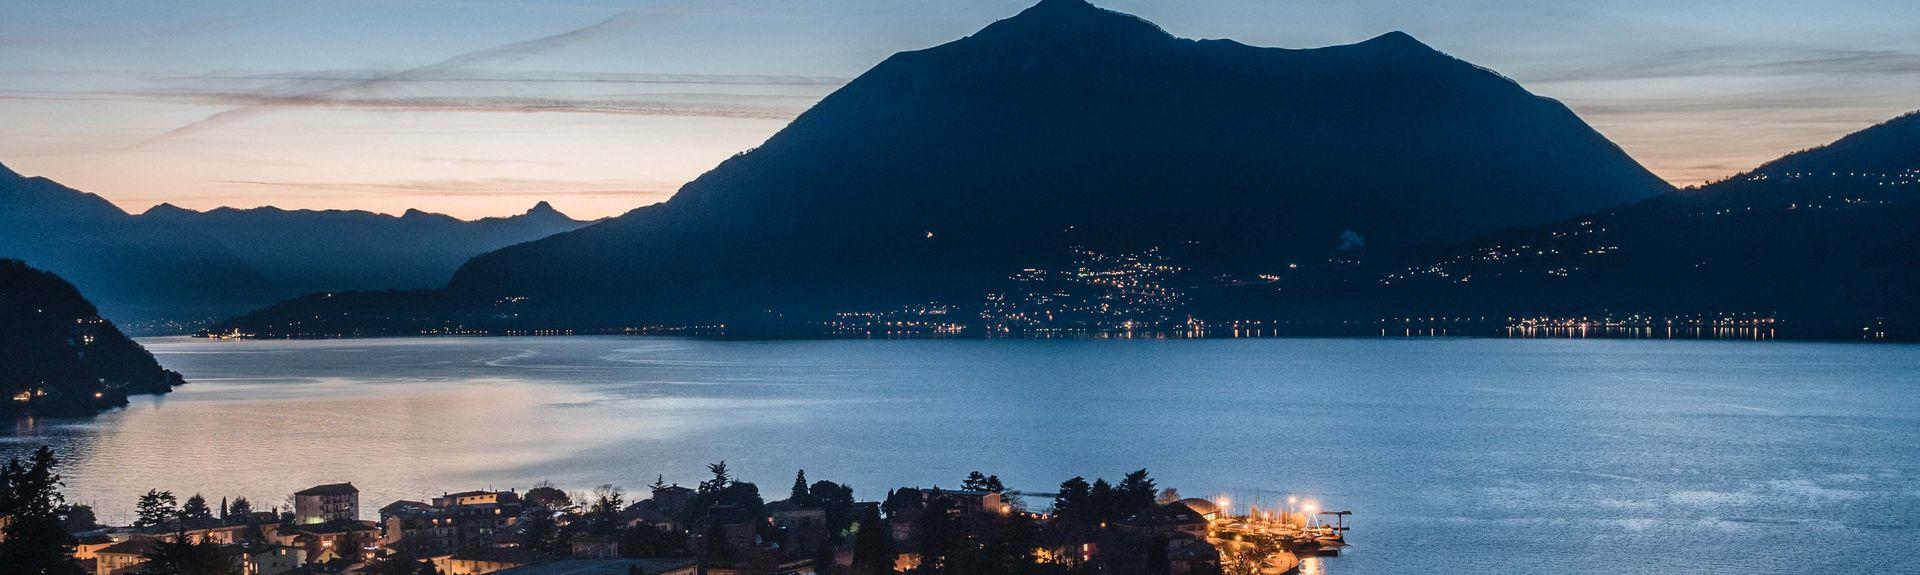 Gera Lario, Lombardei, Italien